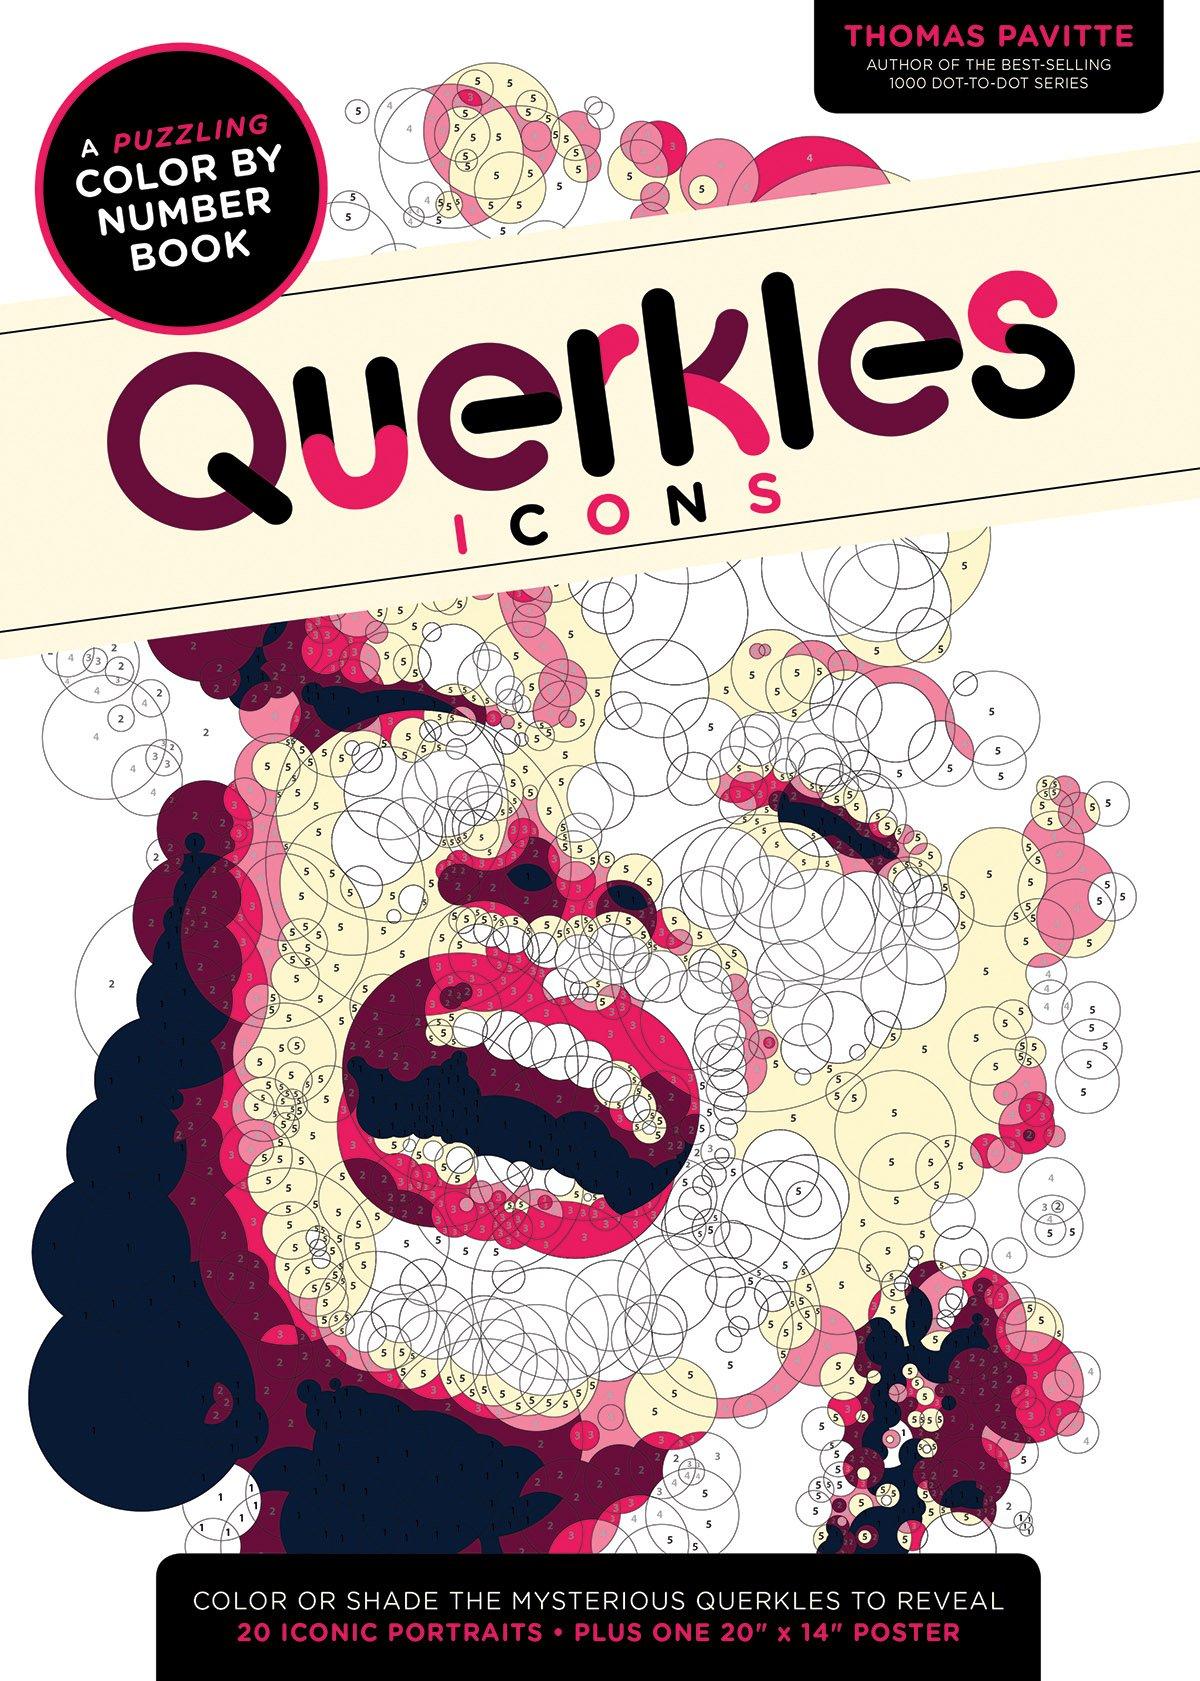 Querkles Icons Thomas Pavitte product image